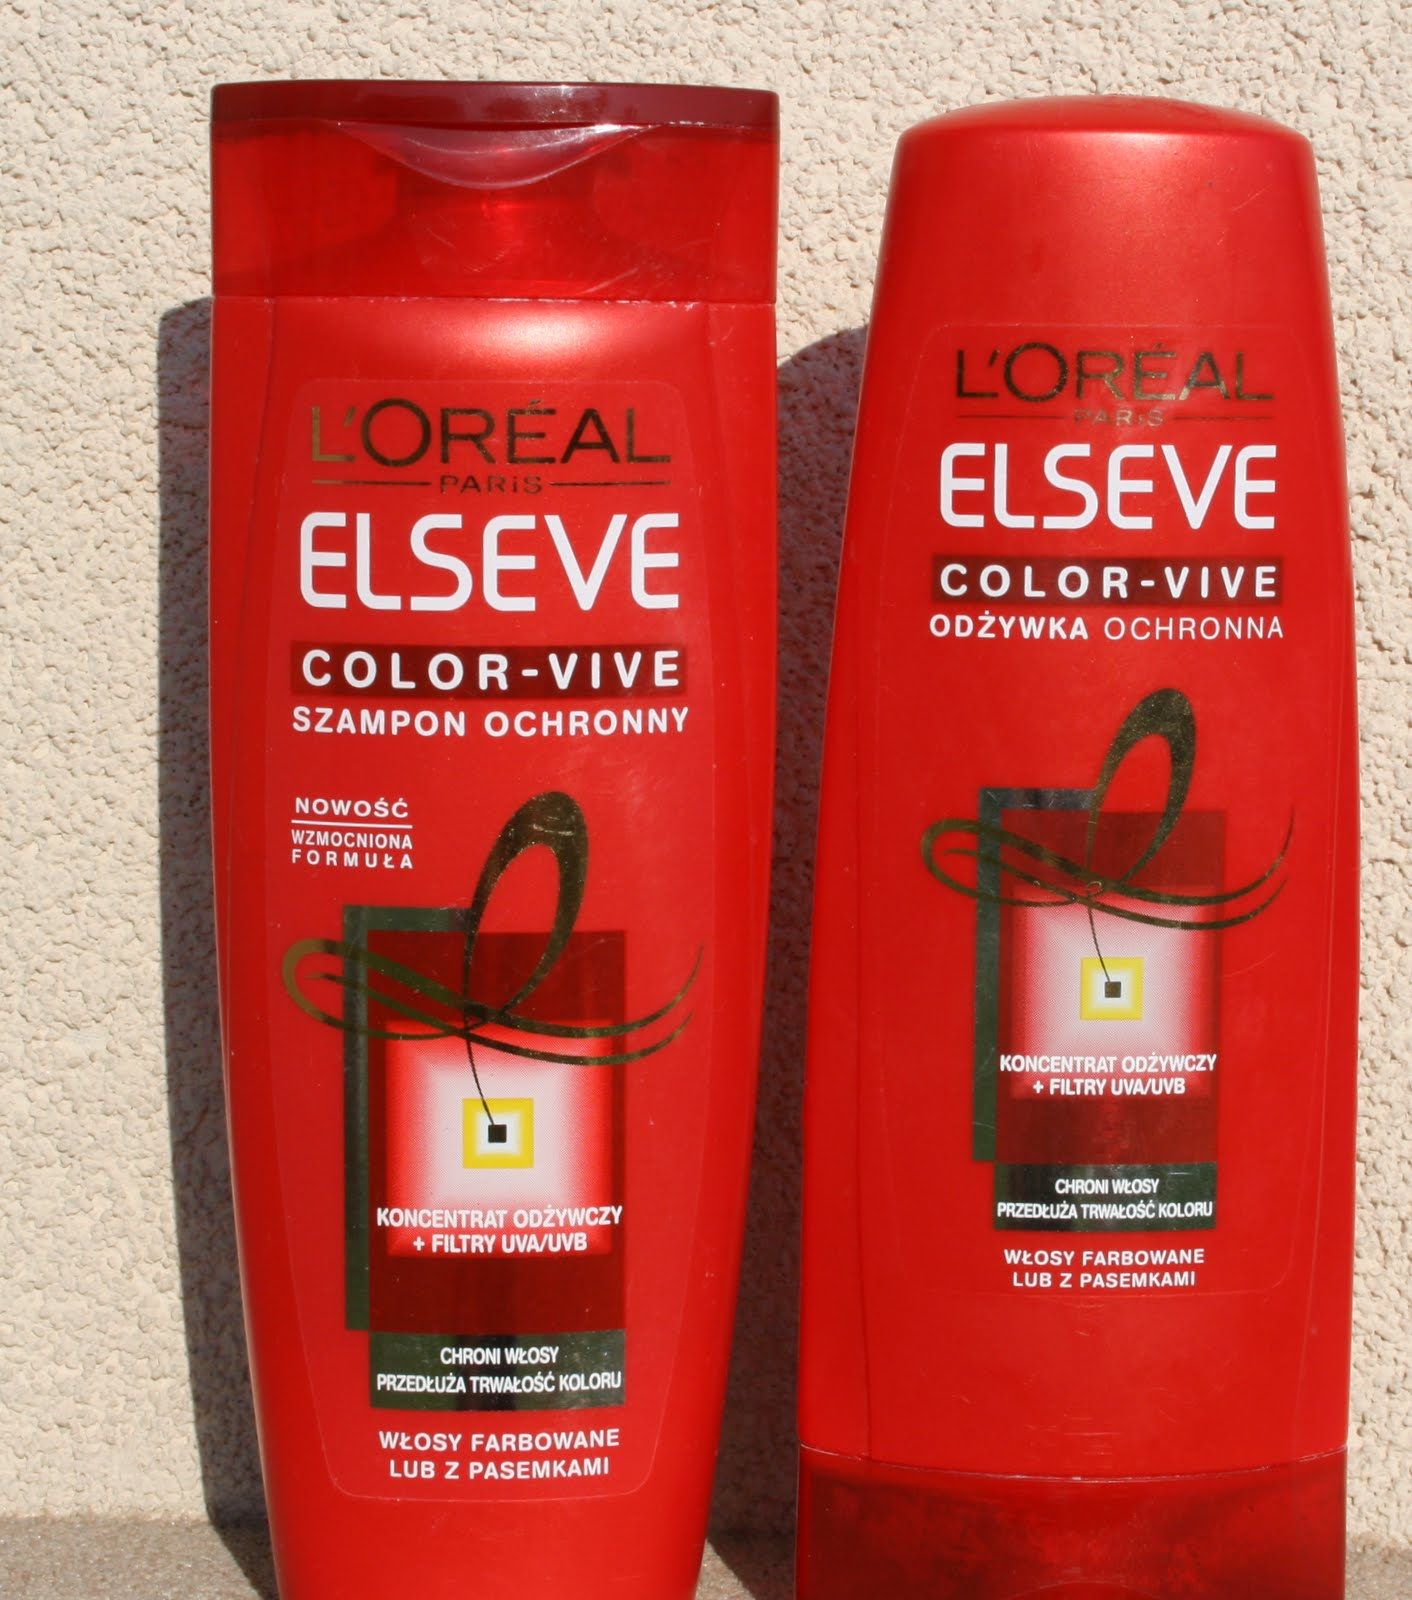 elseve color vive ochrona wosw farbowanych i z pasemkami - Elseve Color Vive